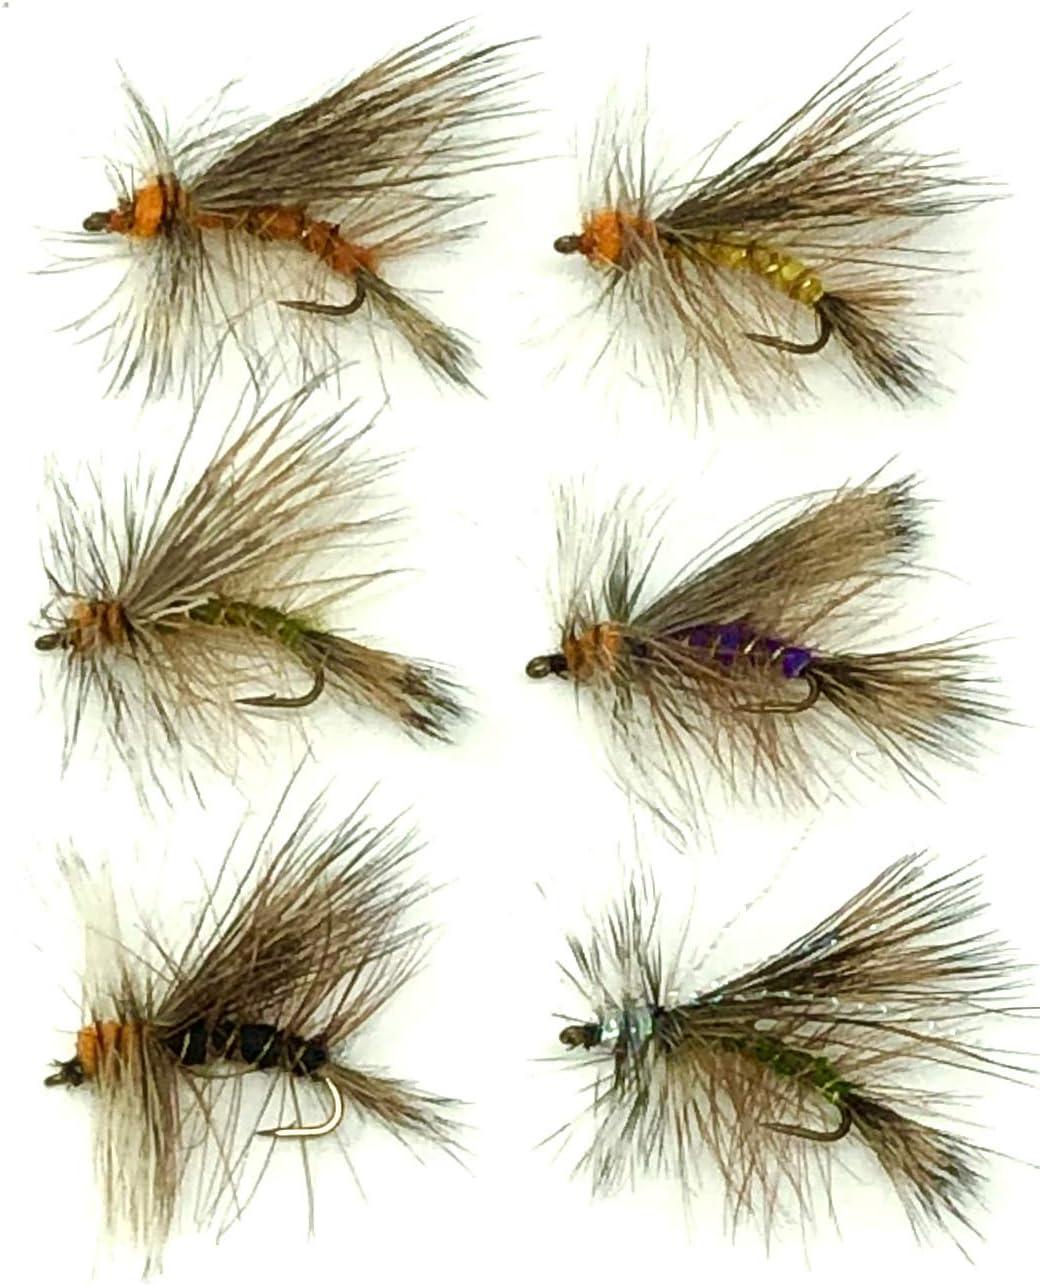 Selling Feeder Creek Assortment Stimulator Dry Fishing 36 Fly Lures Popular popular